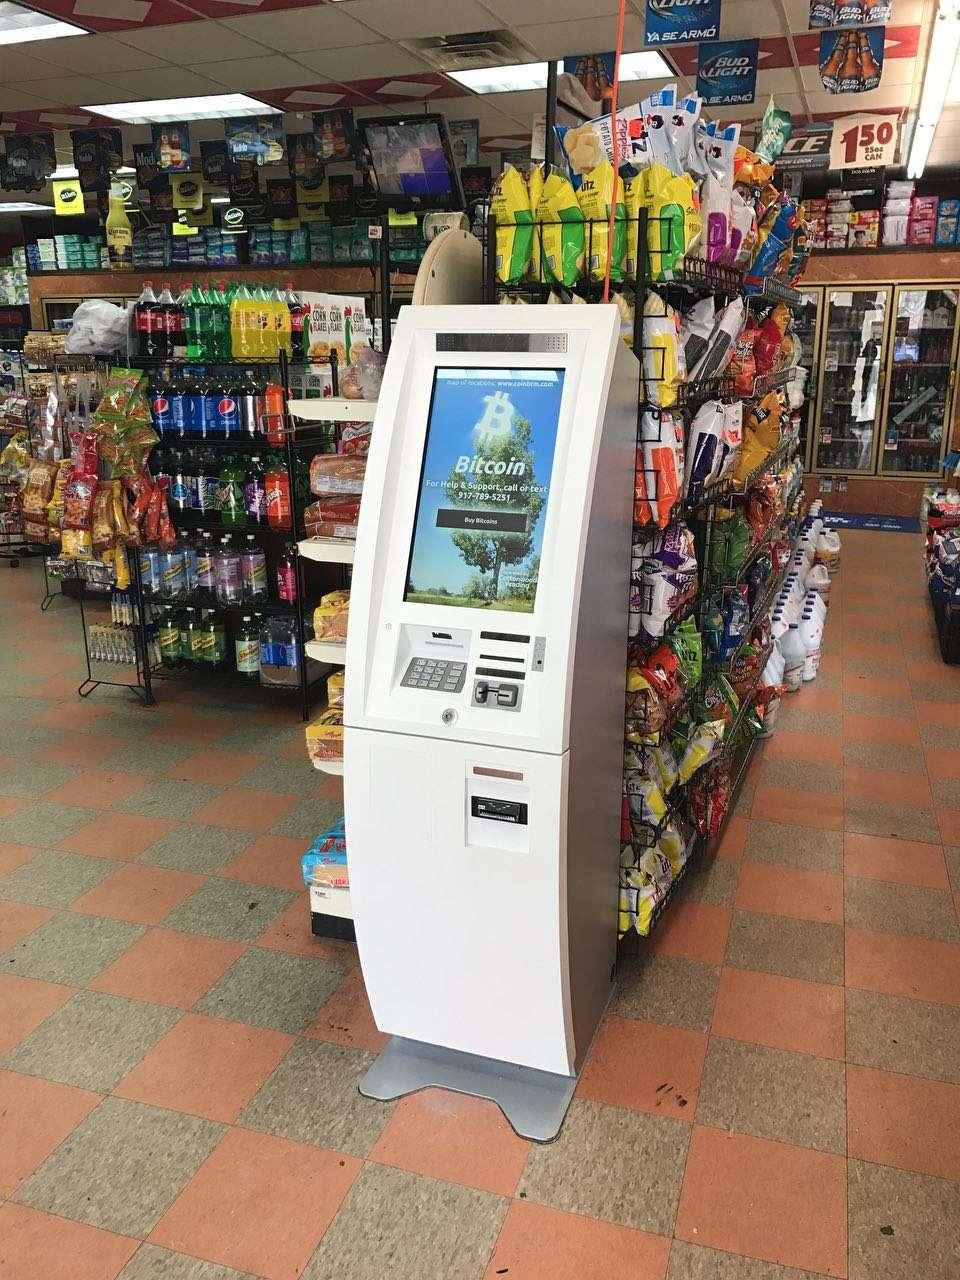 CoinBTM - Bitcoin ATM - atm  | Photo 7 of 7 | Address: 5401 Flatlands Ave, Brooklyn, NY 11234, USA | Phone: (917) 789-5251